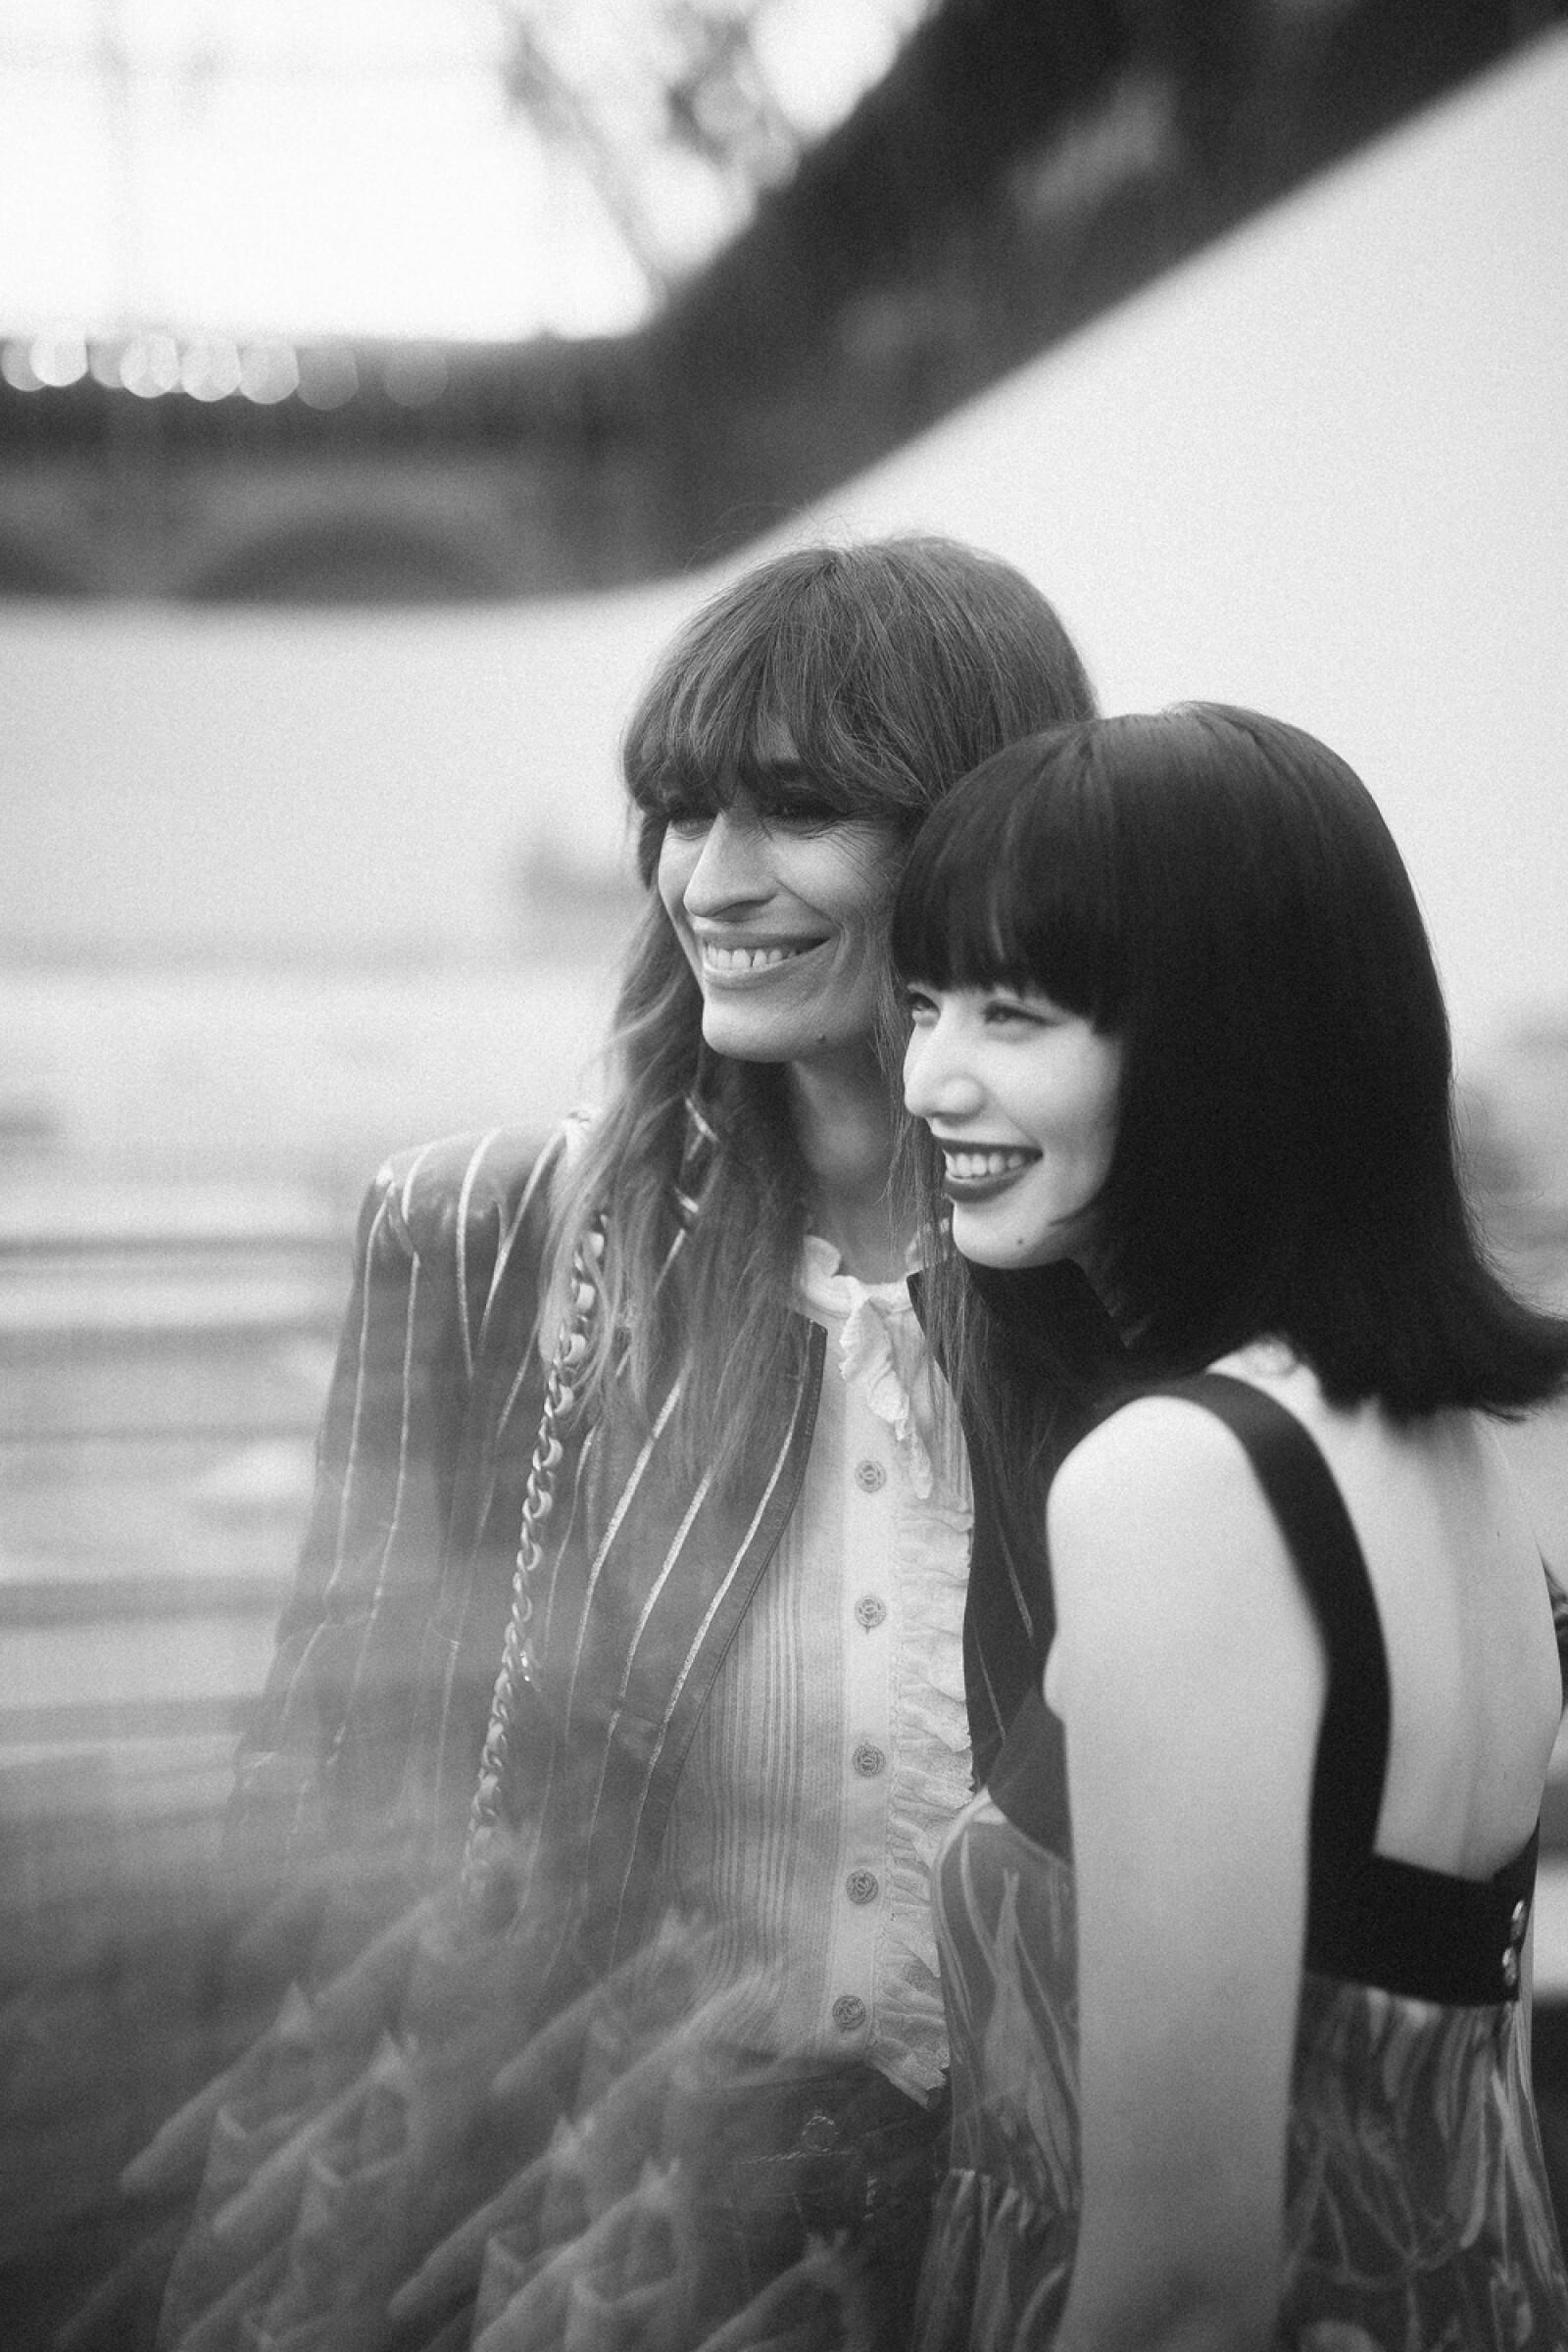 08_Caroline_DE_MAIGRET_with_Nana_KOMATSU_Spring_Summer_2020_Ready_to_wear_Collection.jpg